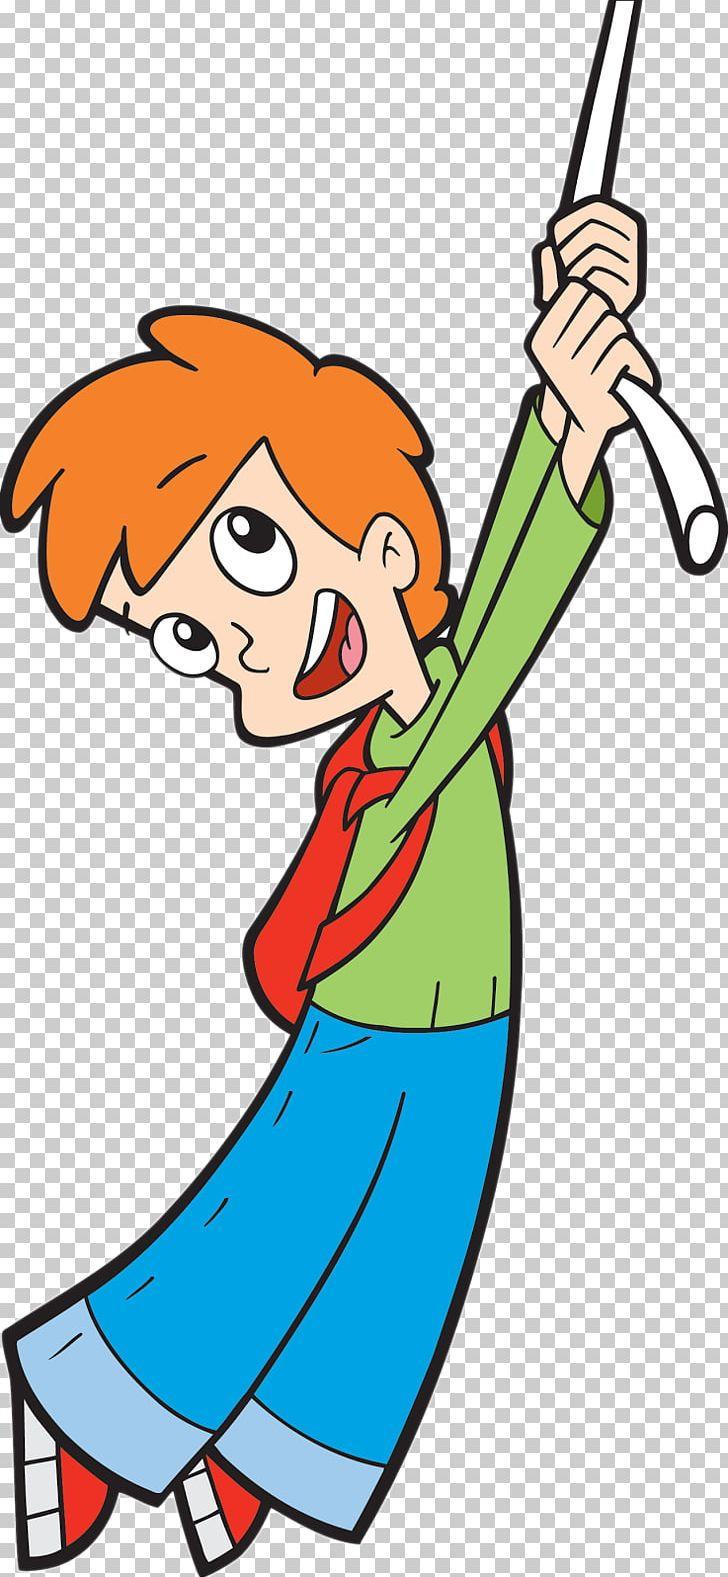 Cartoon Character PNG, Clipart, Animated Cartoon, Area, Art, Artwork, Cartoon Free PNG Download